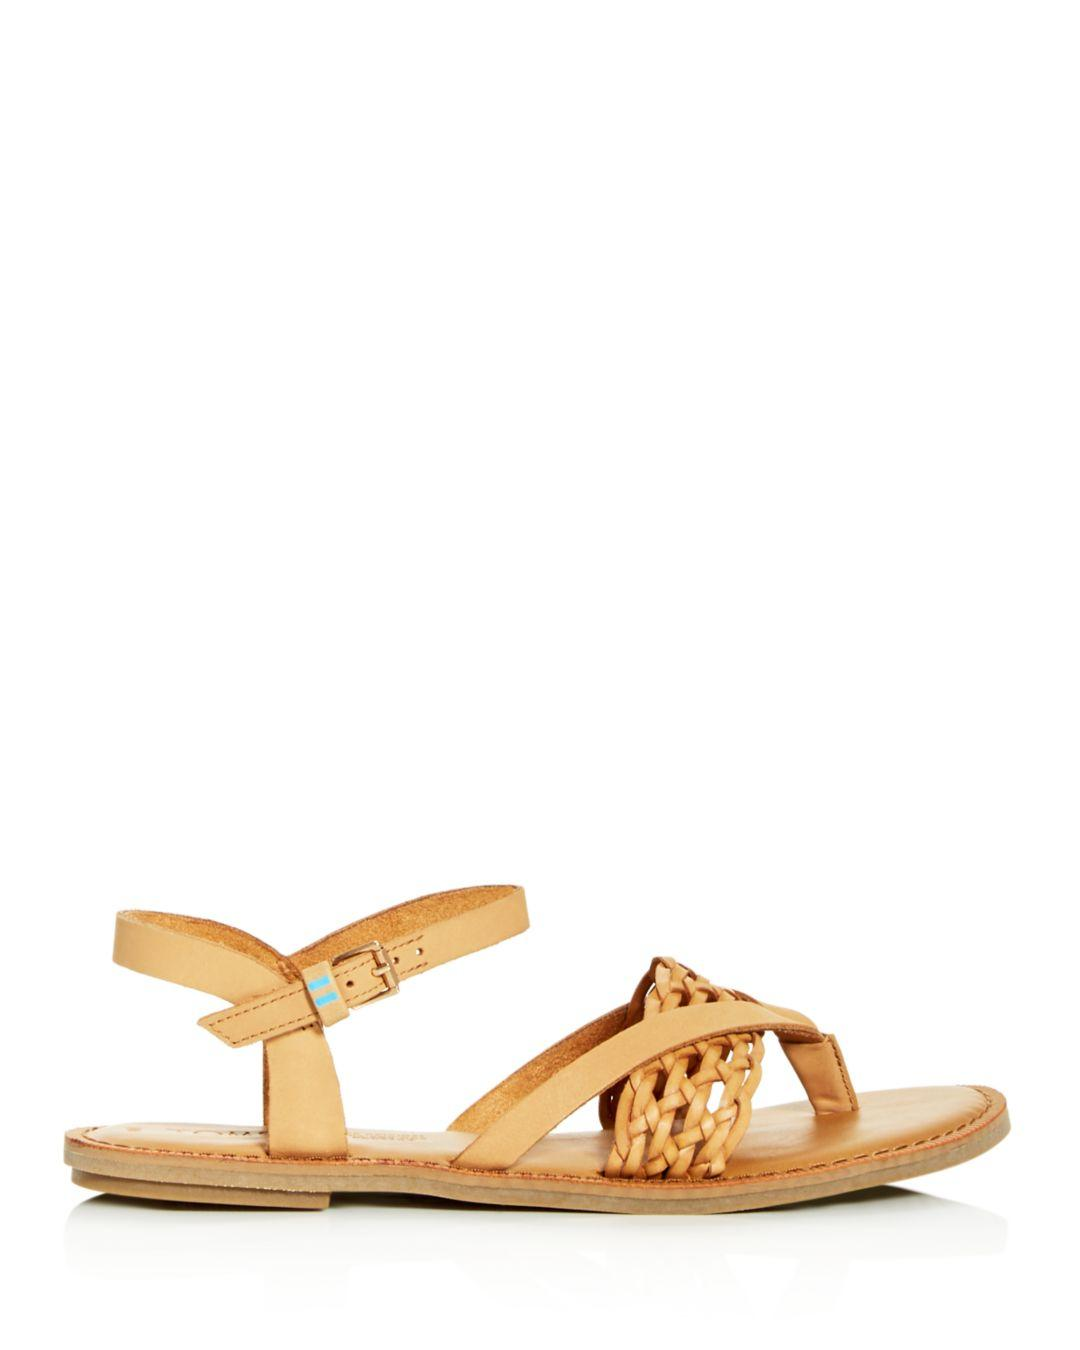 df675e6cc95 TOMS Women s Lexie Thong Sandals in Brown - Lyst